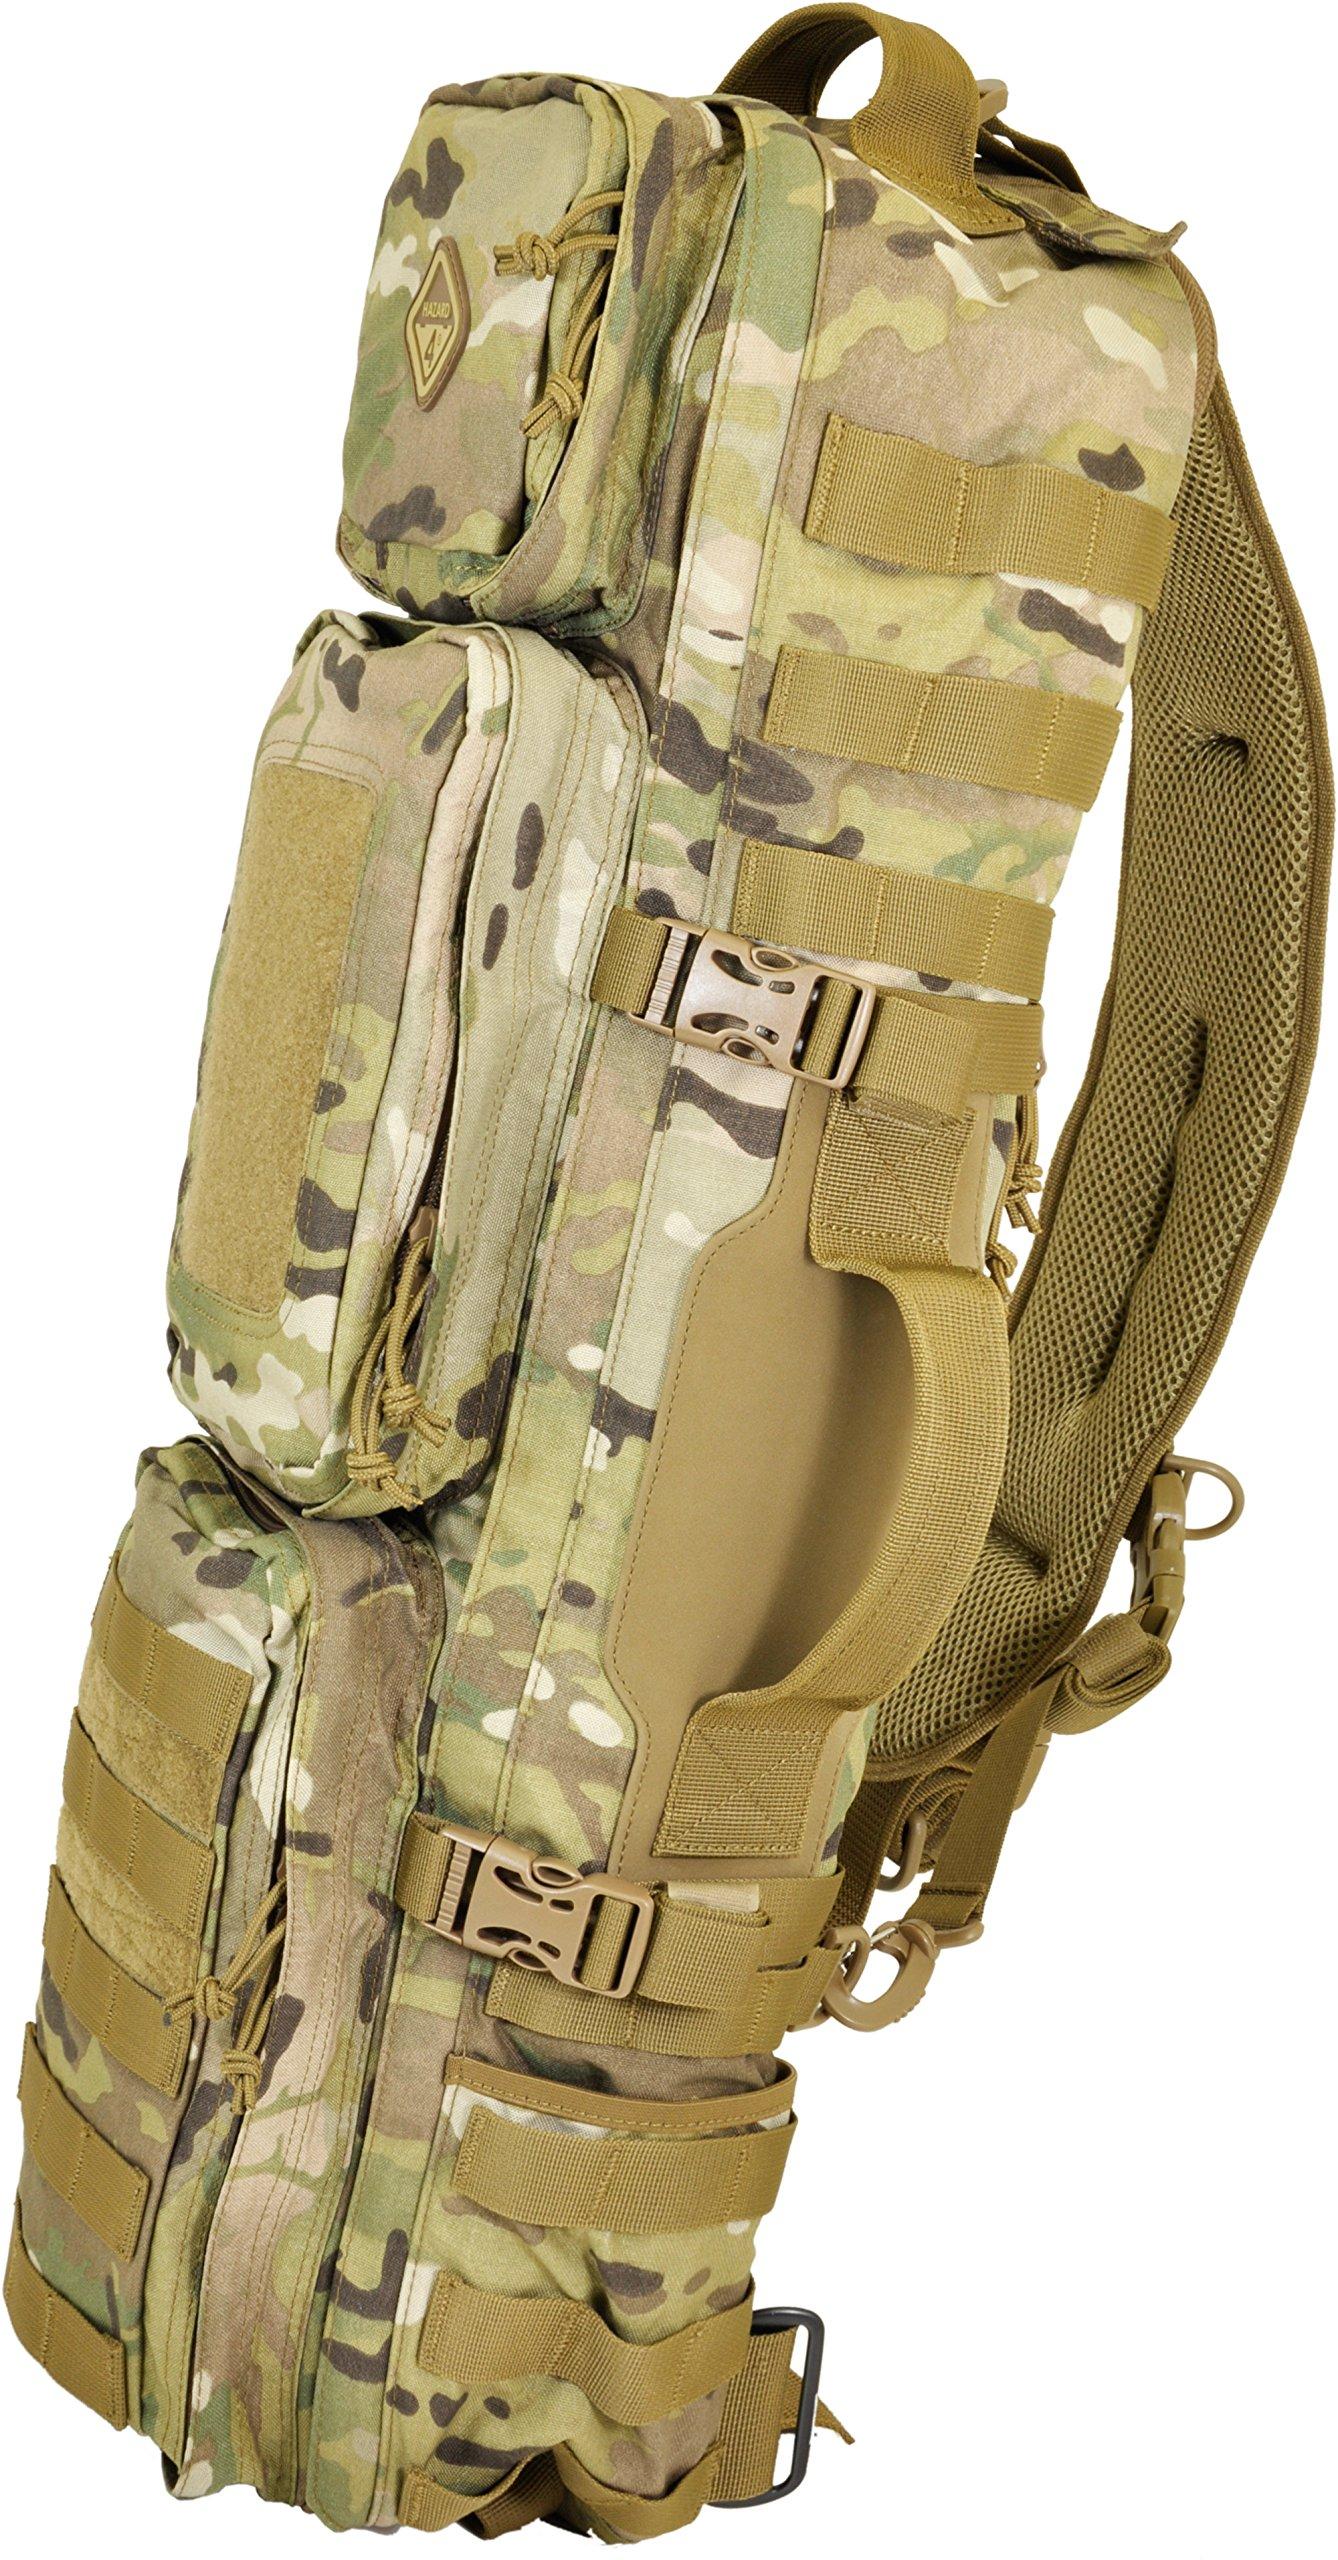 Hazard 4 Evac TakeDown Carbine Sling Pack, Multicam